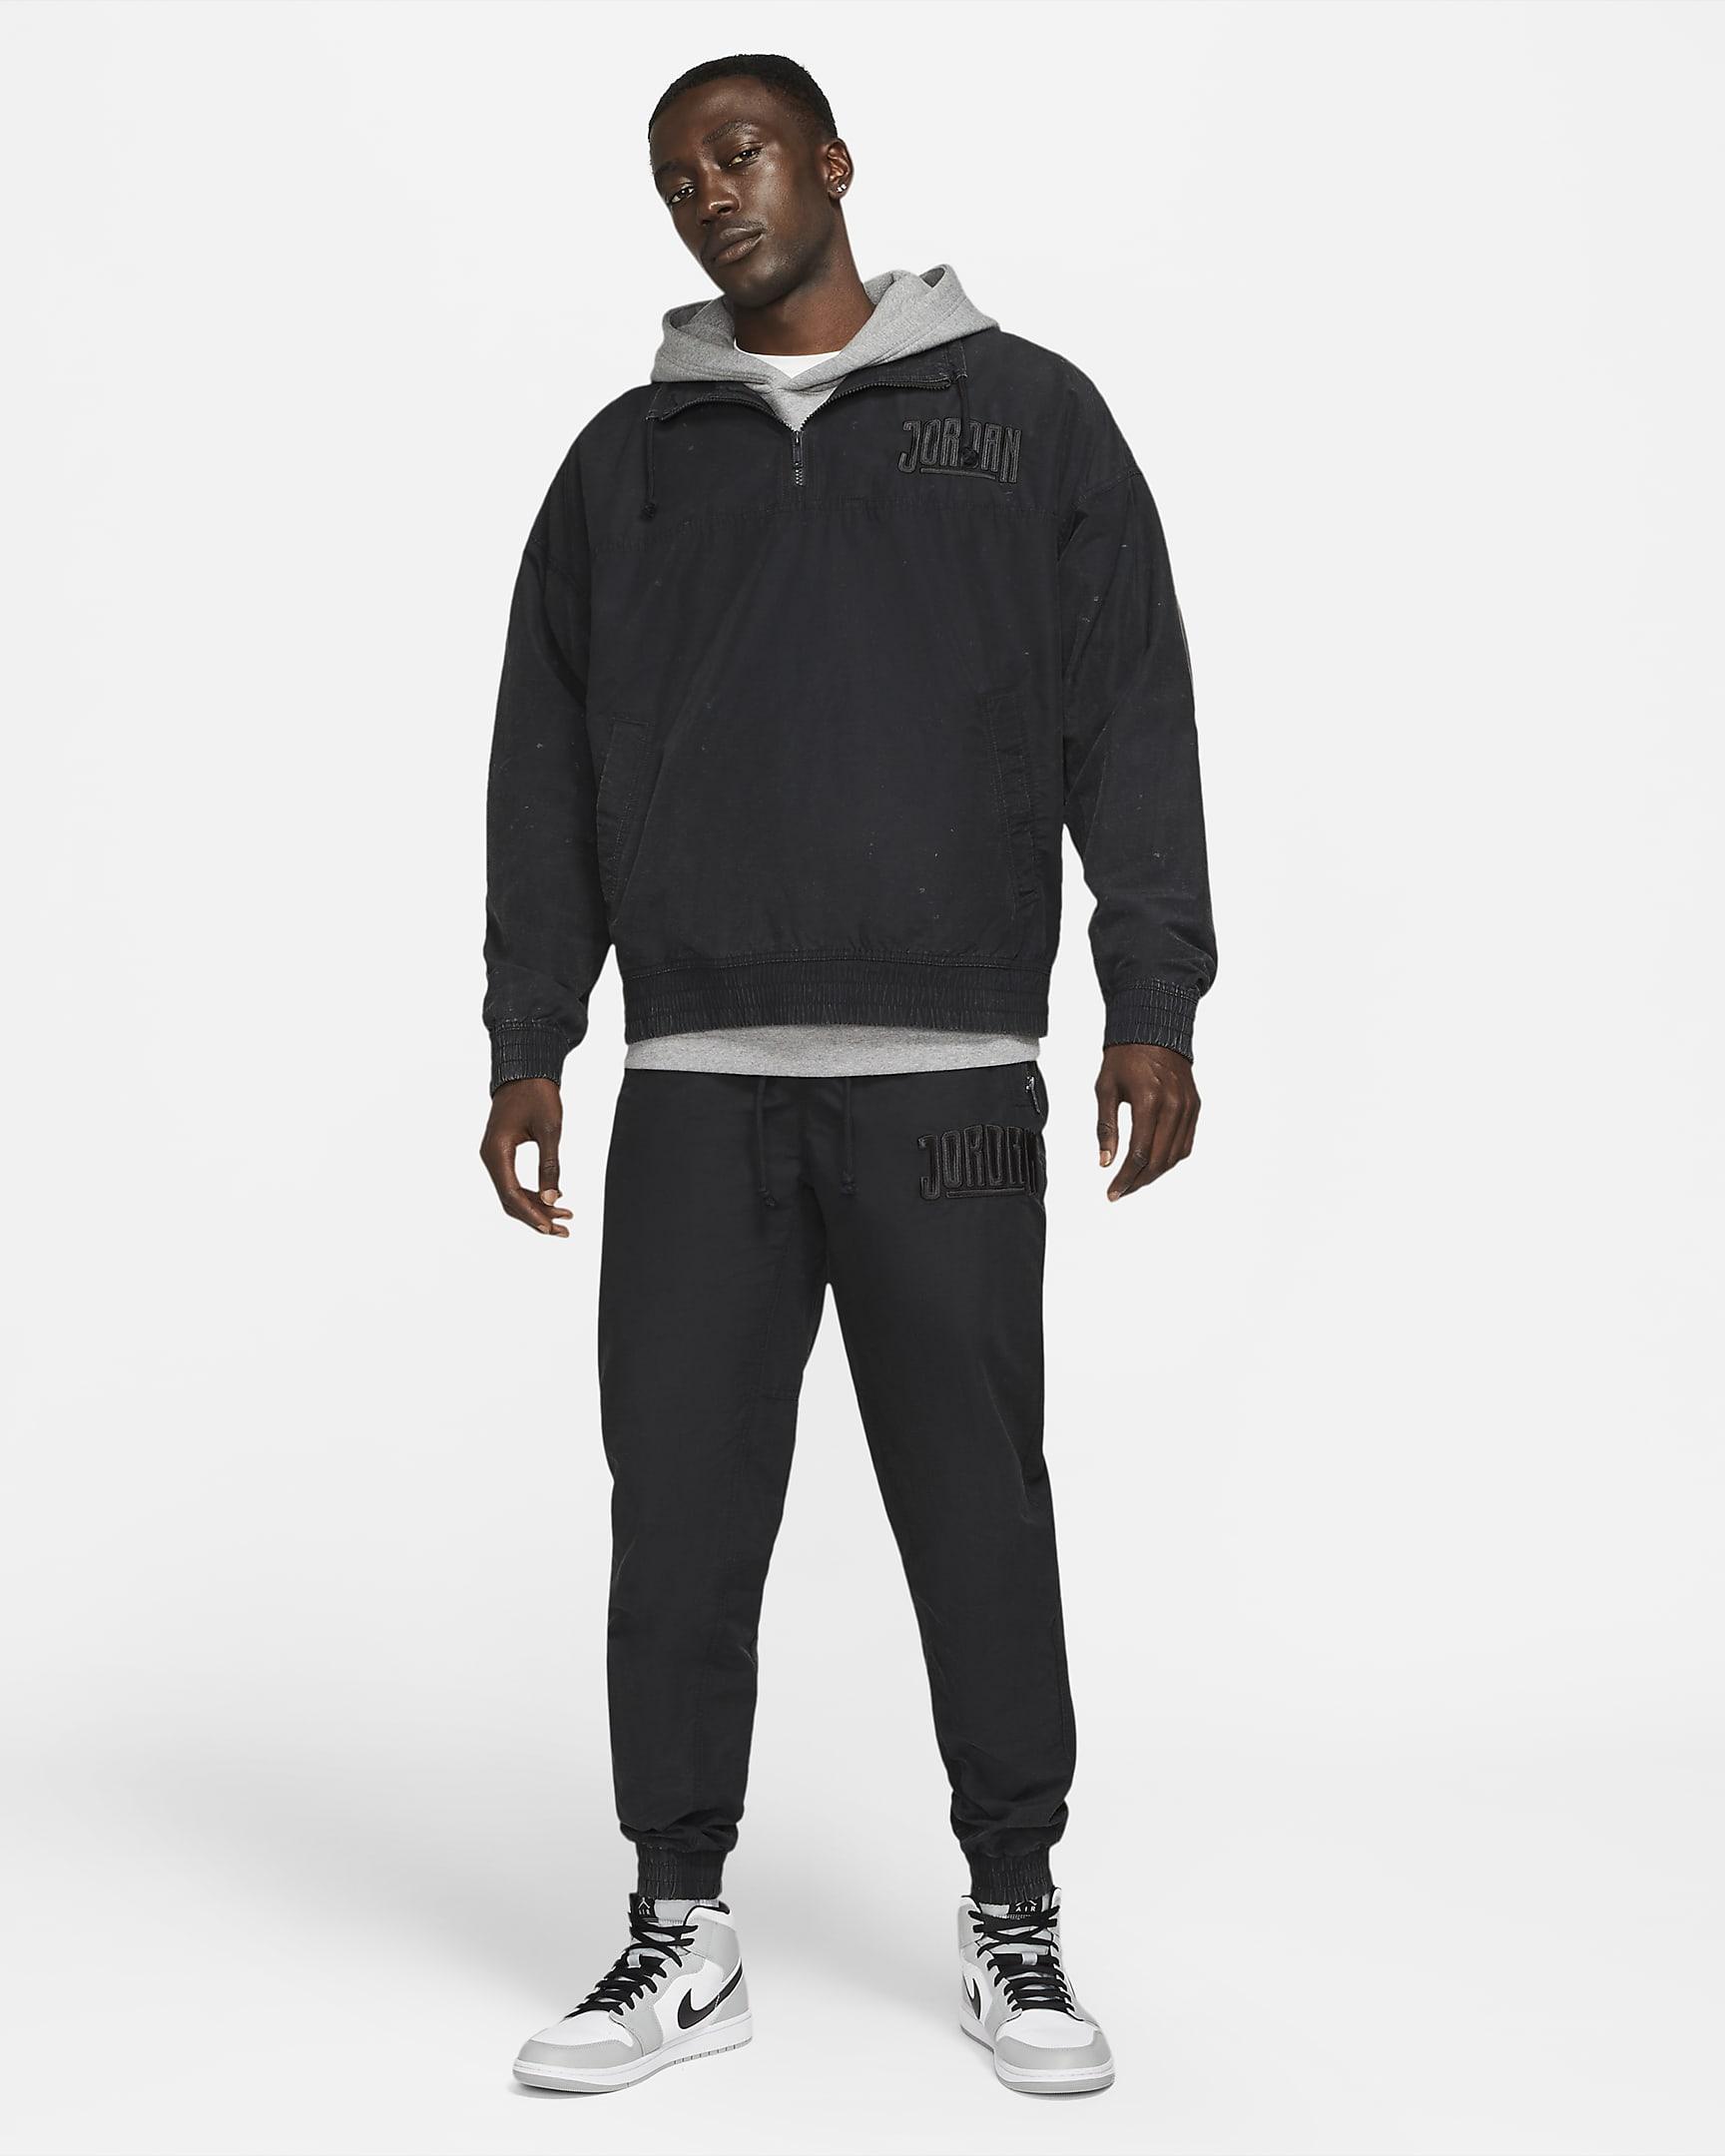 jordan-sport-dna-mens-jacket-8dhHDR-2.png